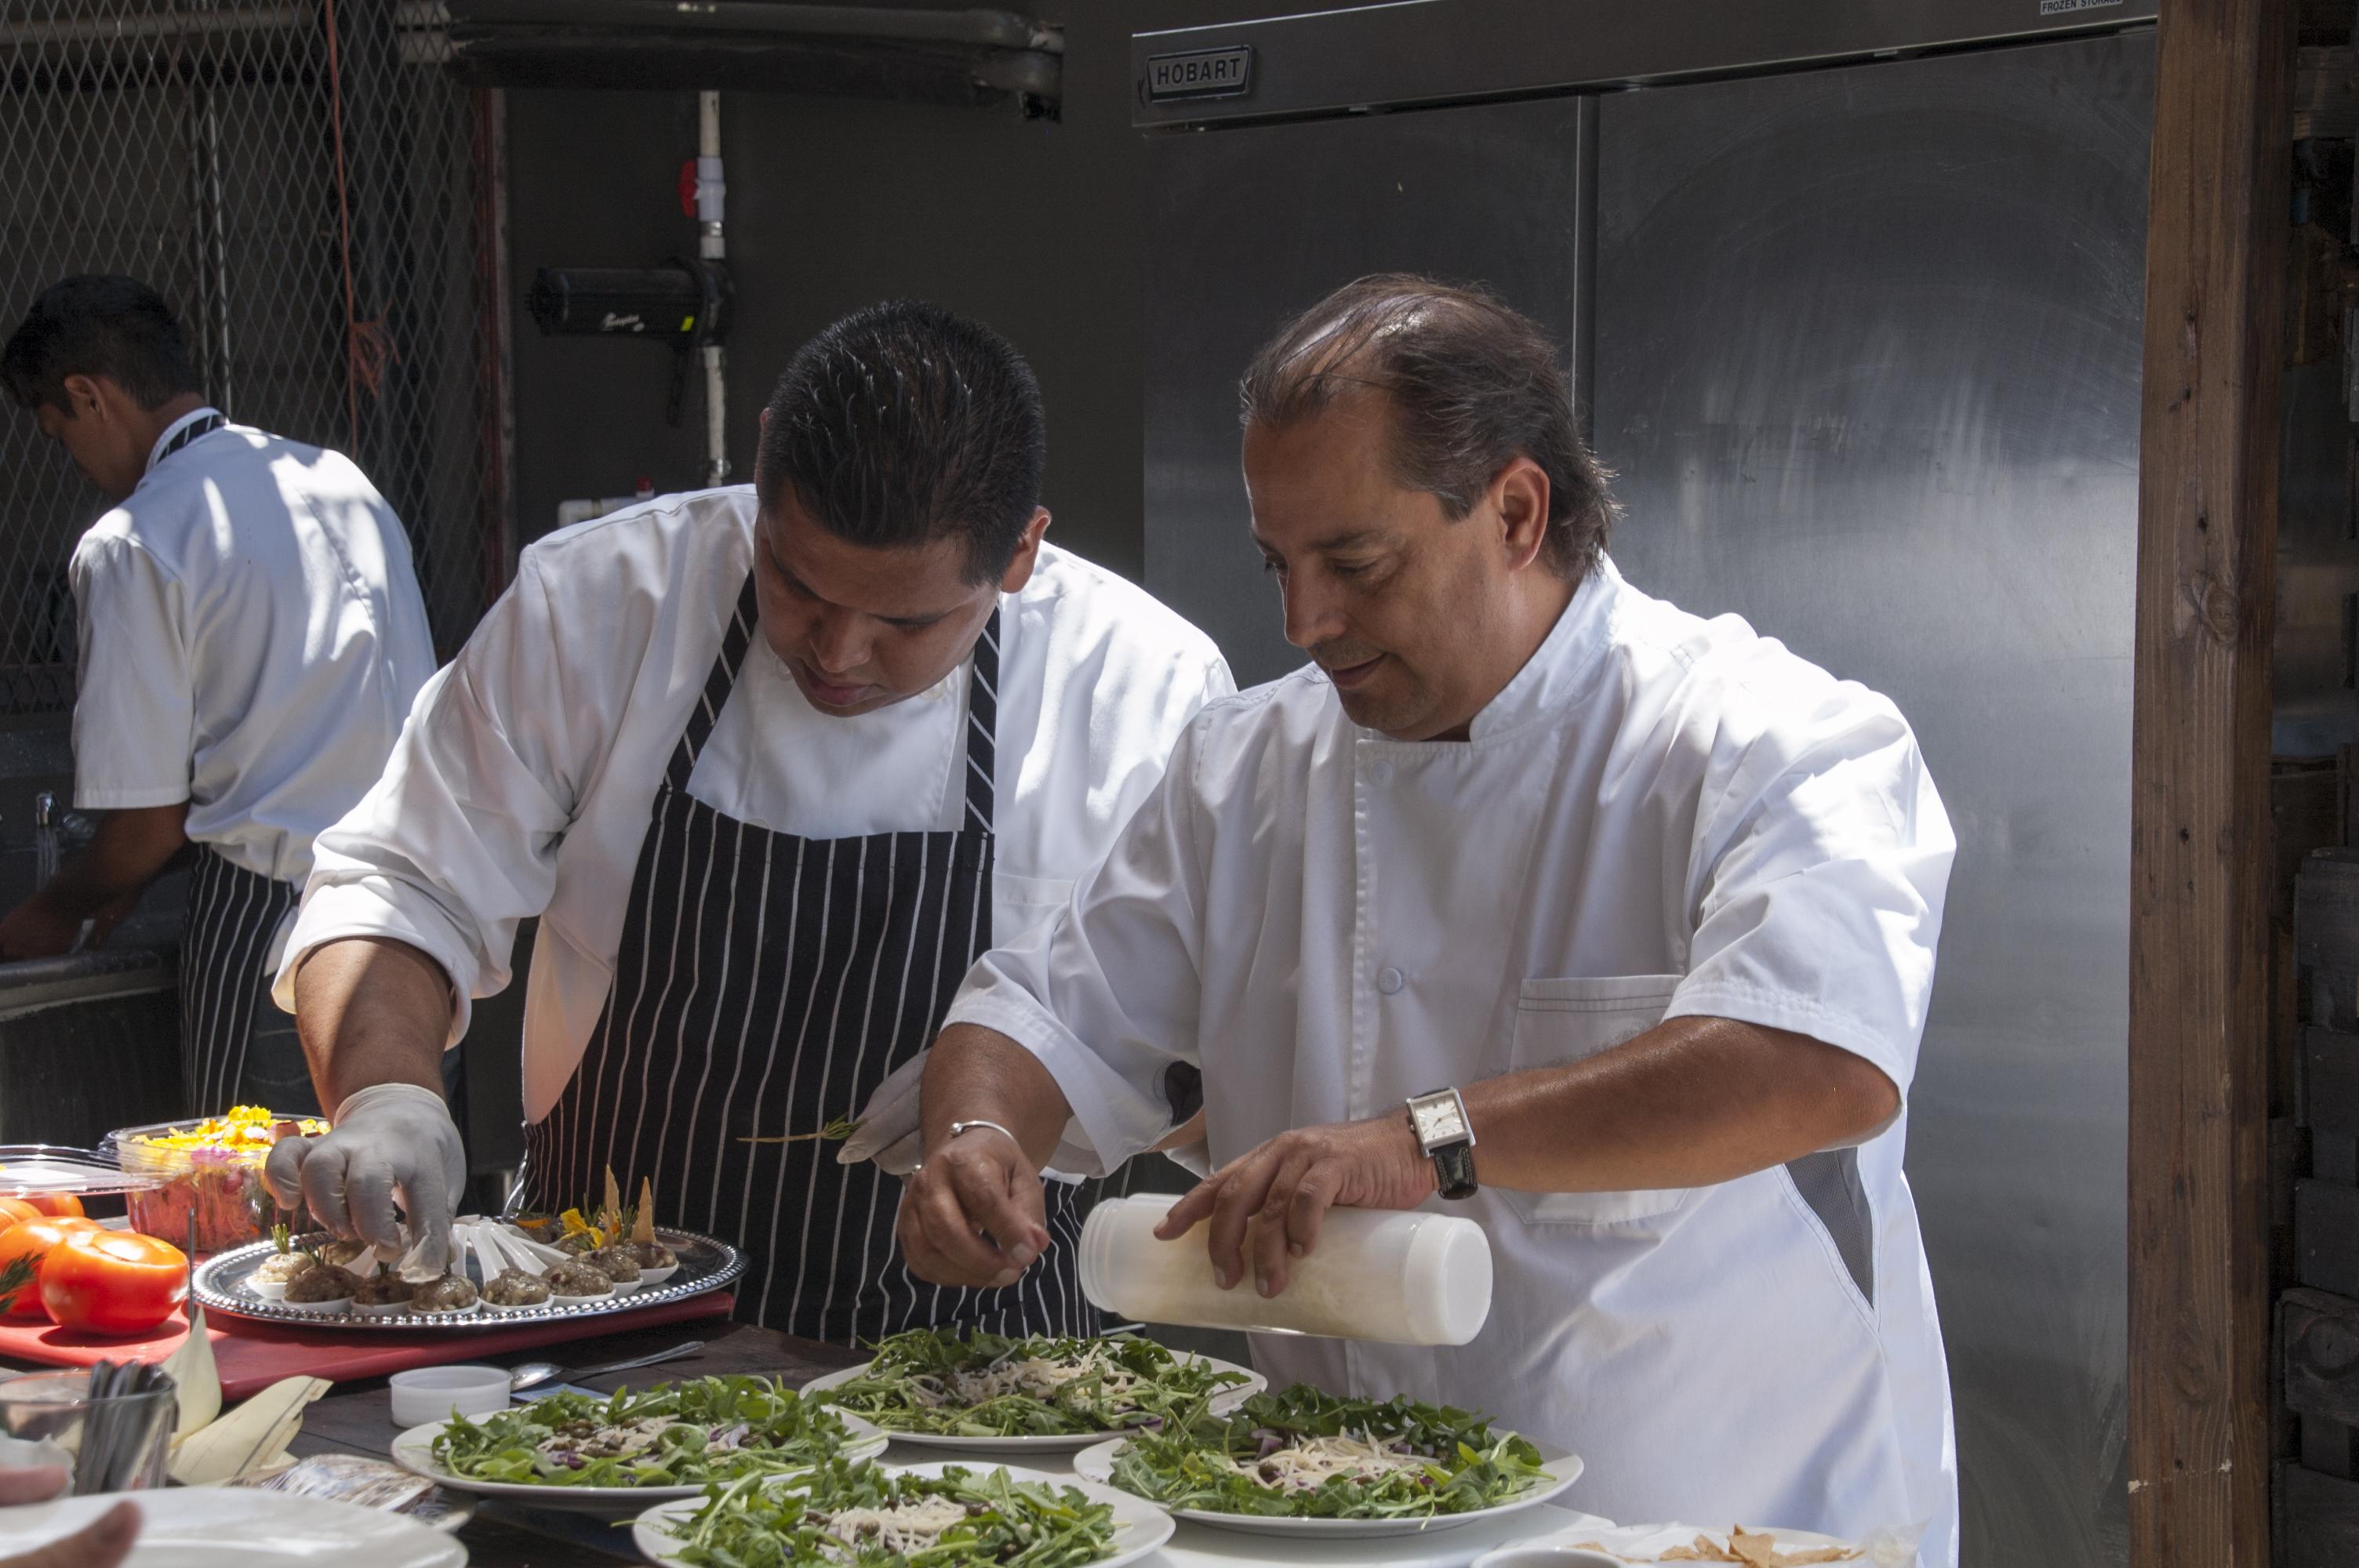 Martin San Roman announces new Valle restaurant at Dobson's 6/26